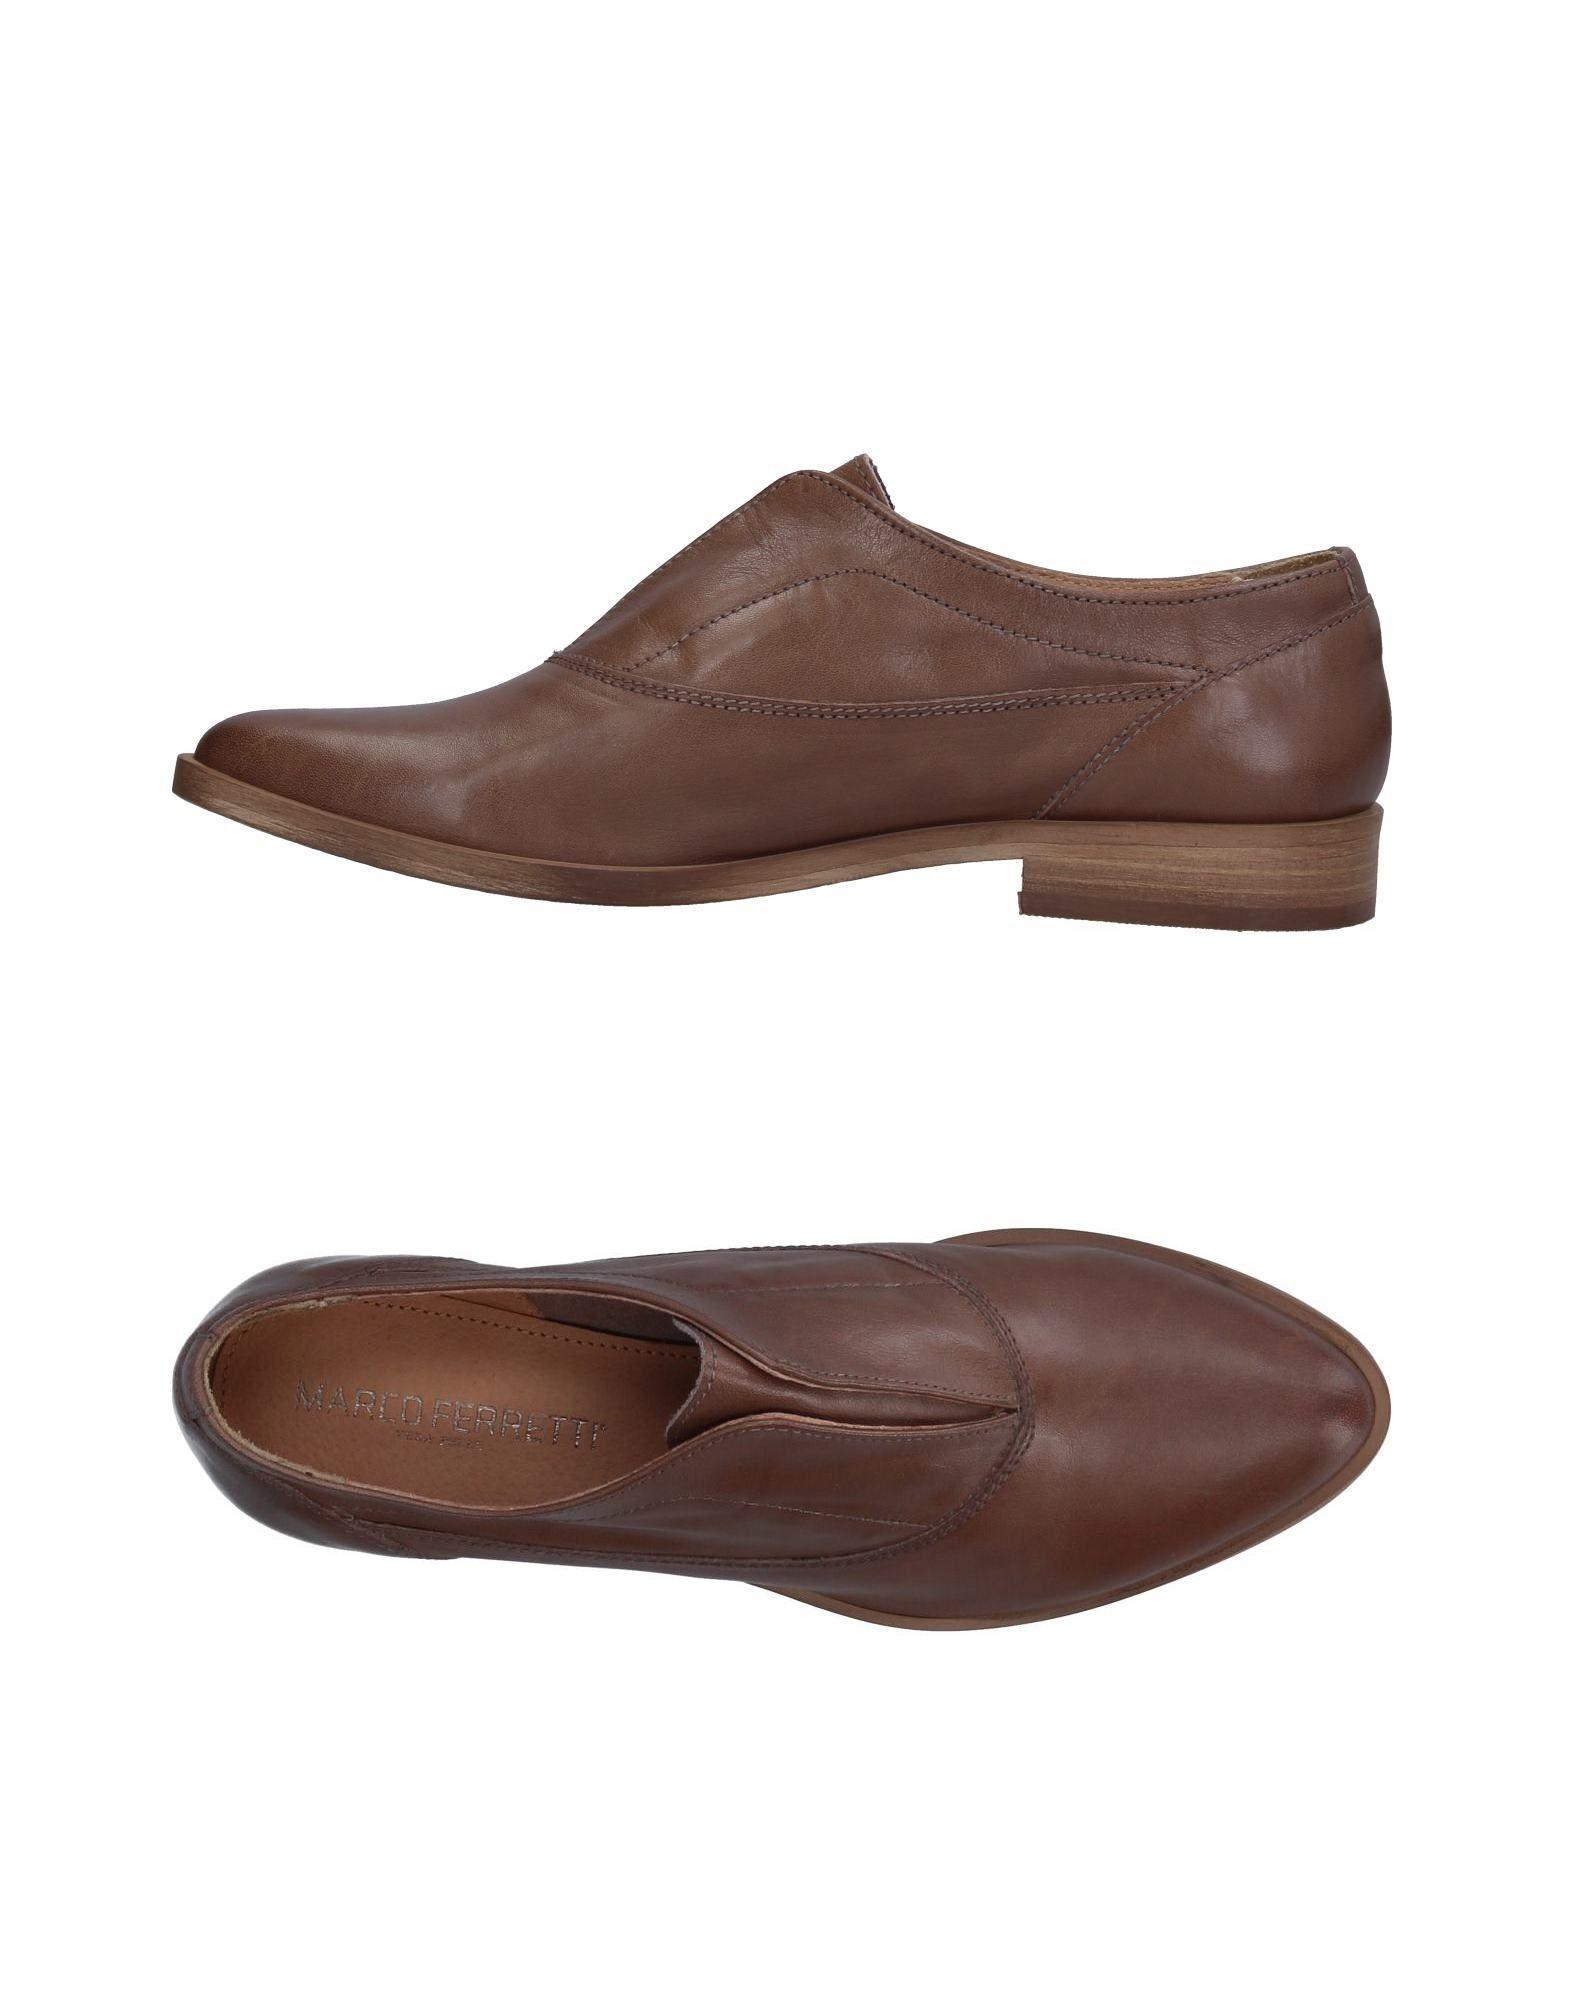 Marco Ferretti Mokassins Damen  11363893QM Gute beliebte Qualität beliebte Gute Schuhe c5fe68